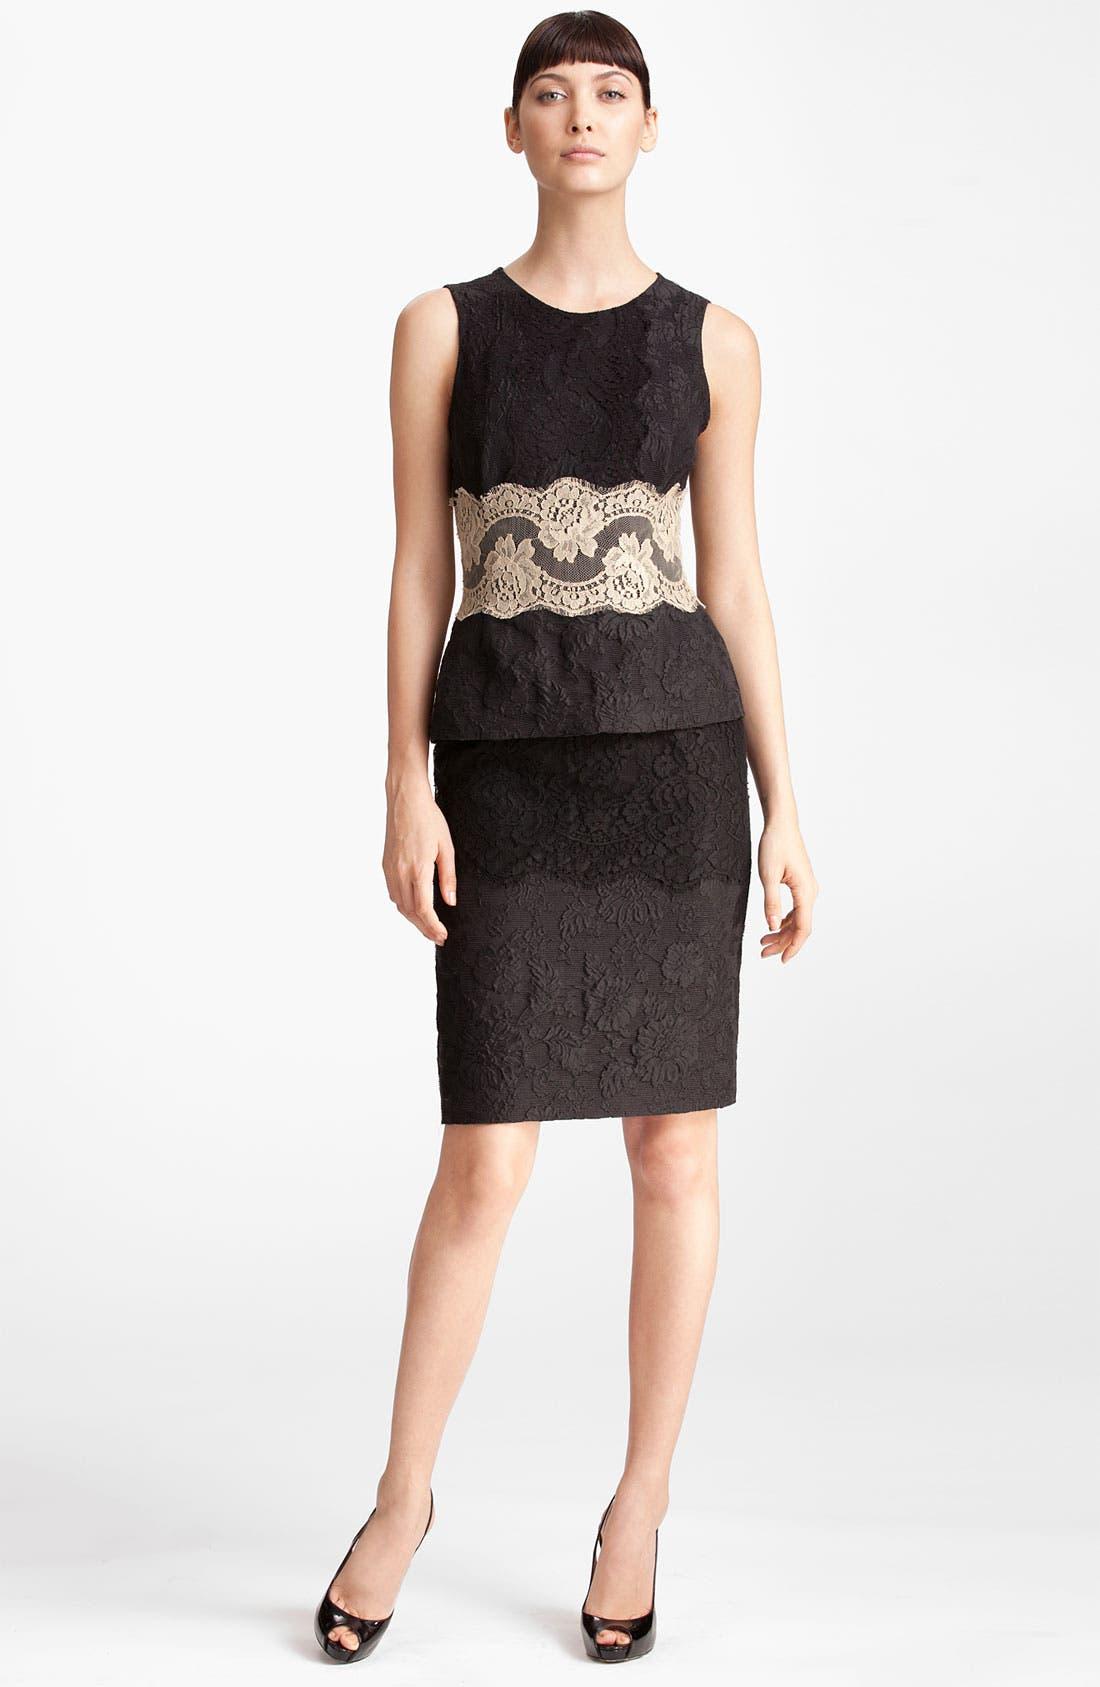 Main Image - Dolce&Gabbana Contrast Lace & Jacquard Peplum Dress